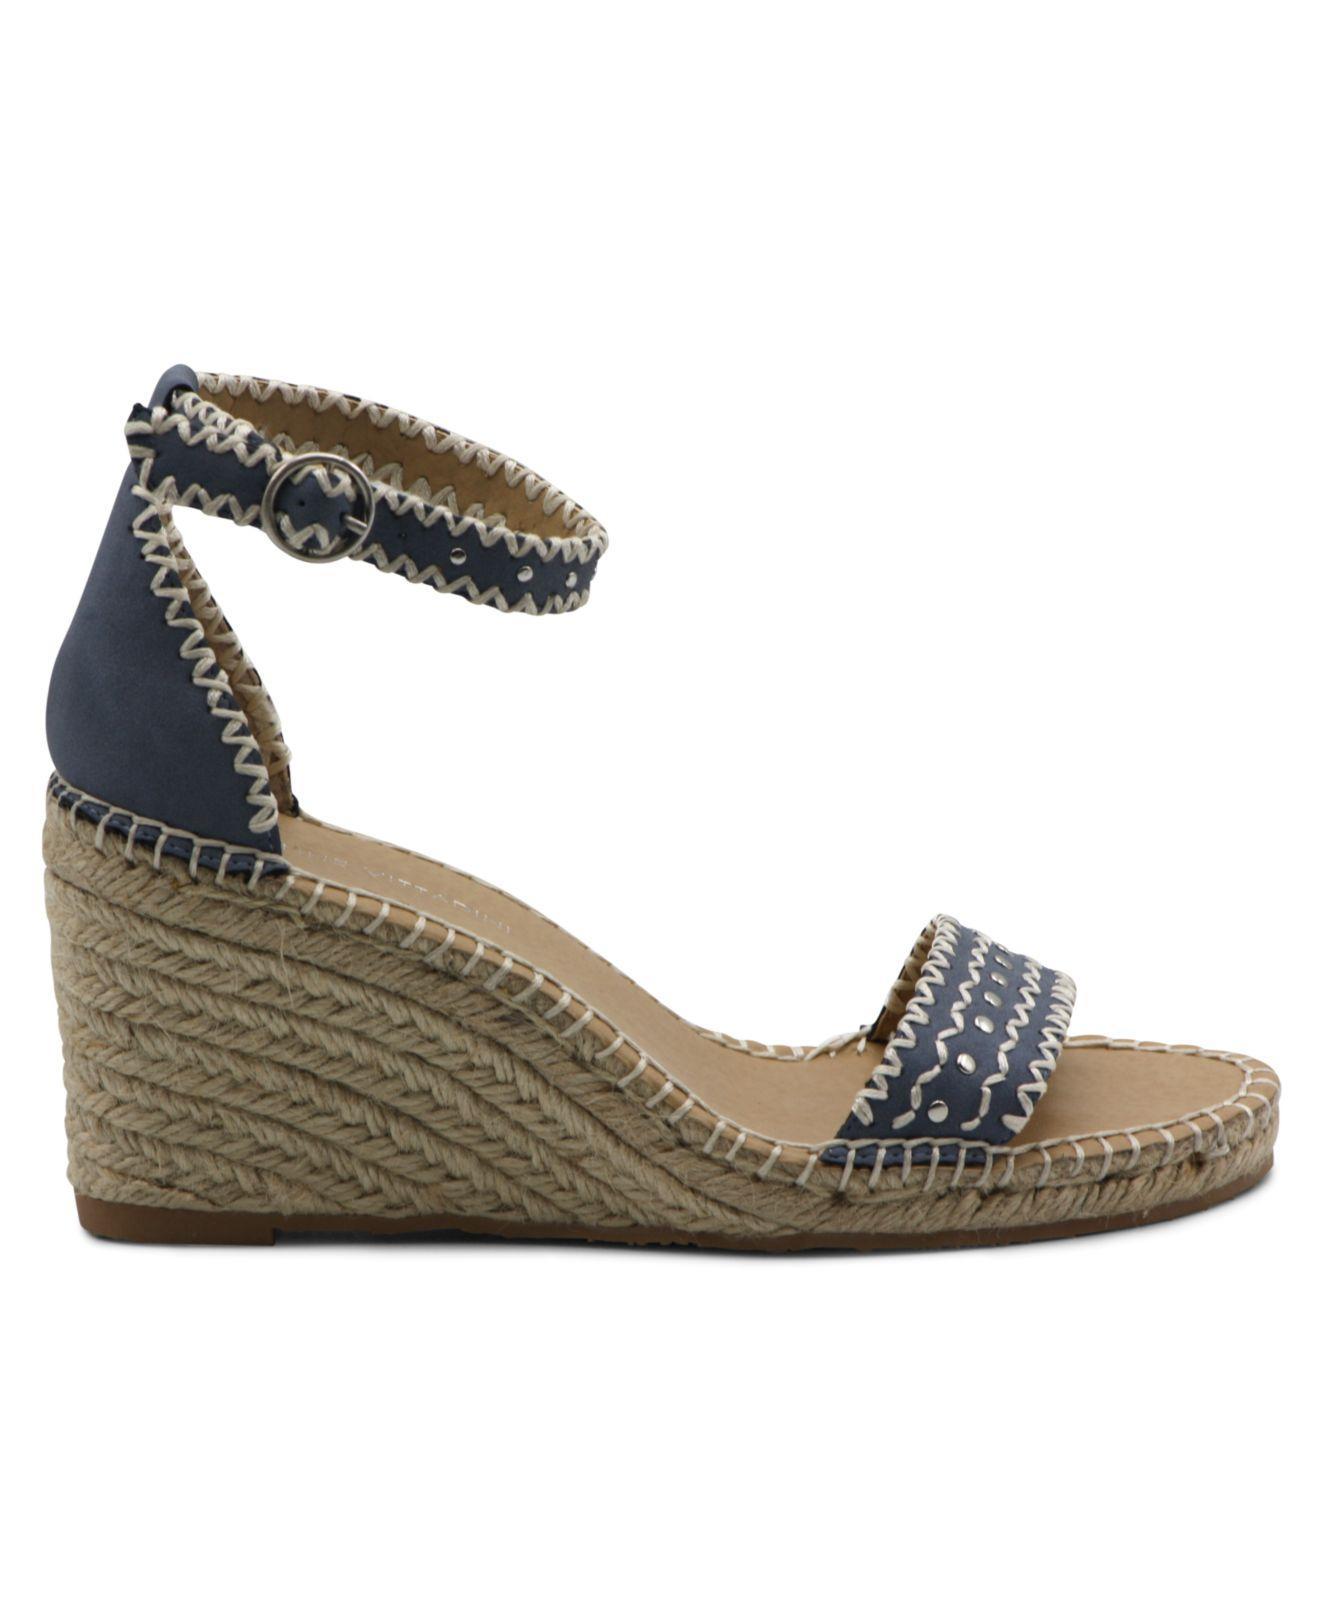 9dc303c000c Women's Blue Charming Espadrille Wedge Sandal